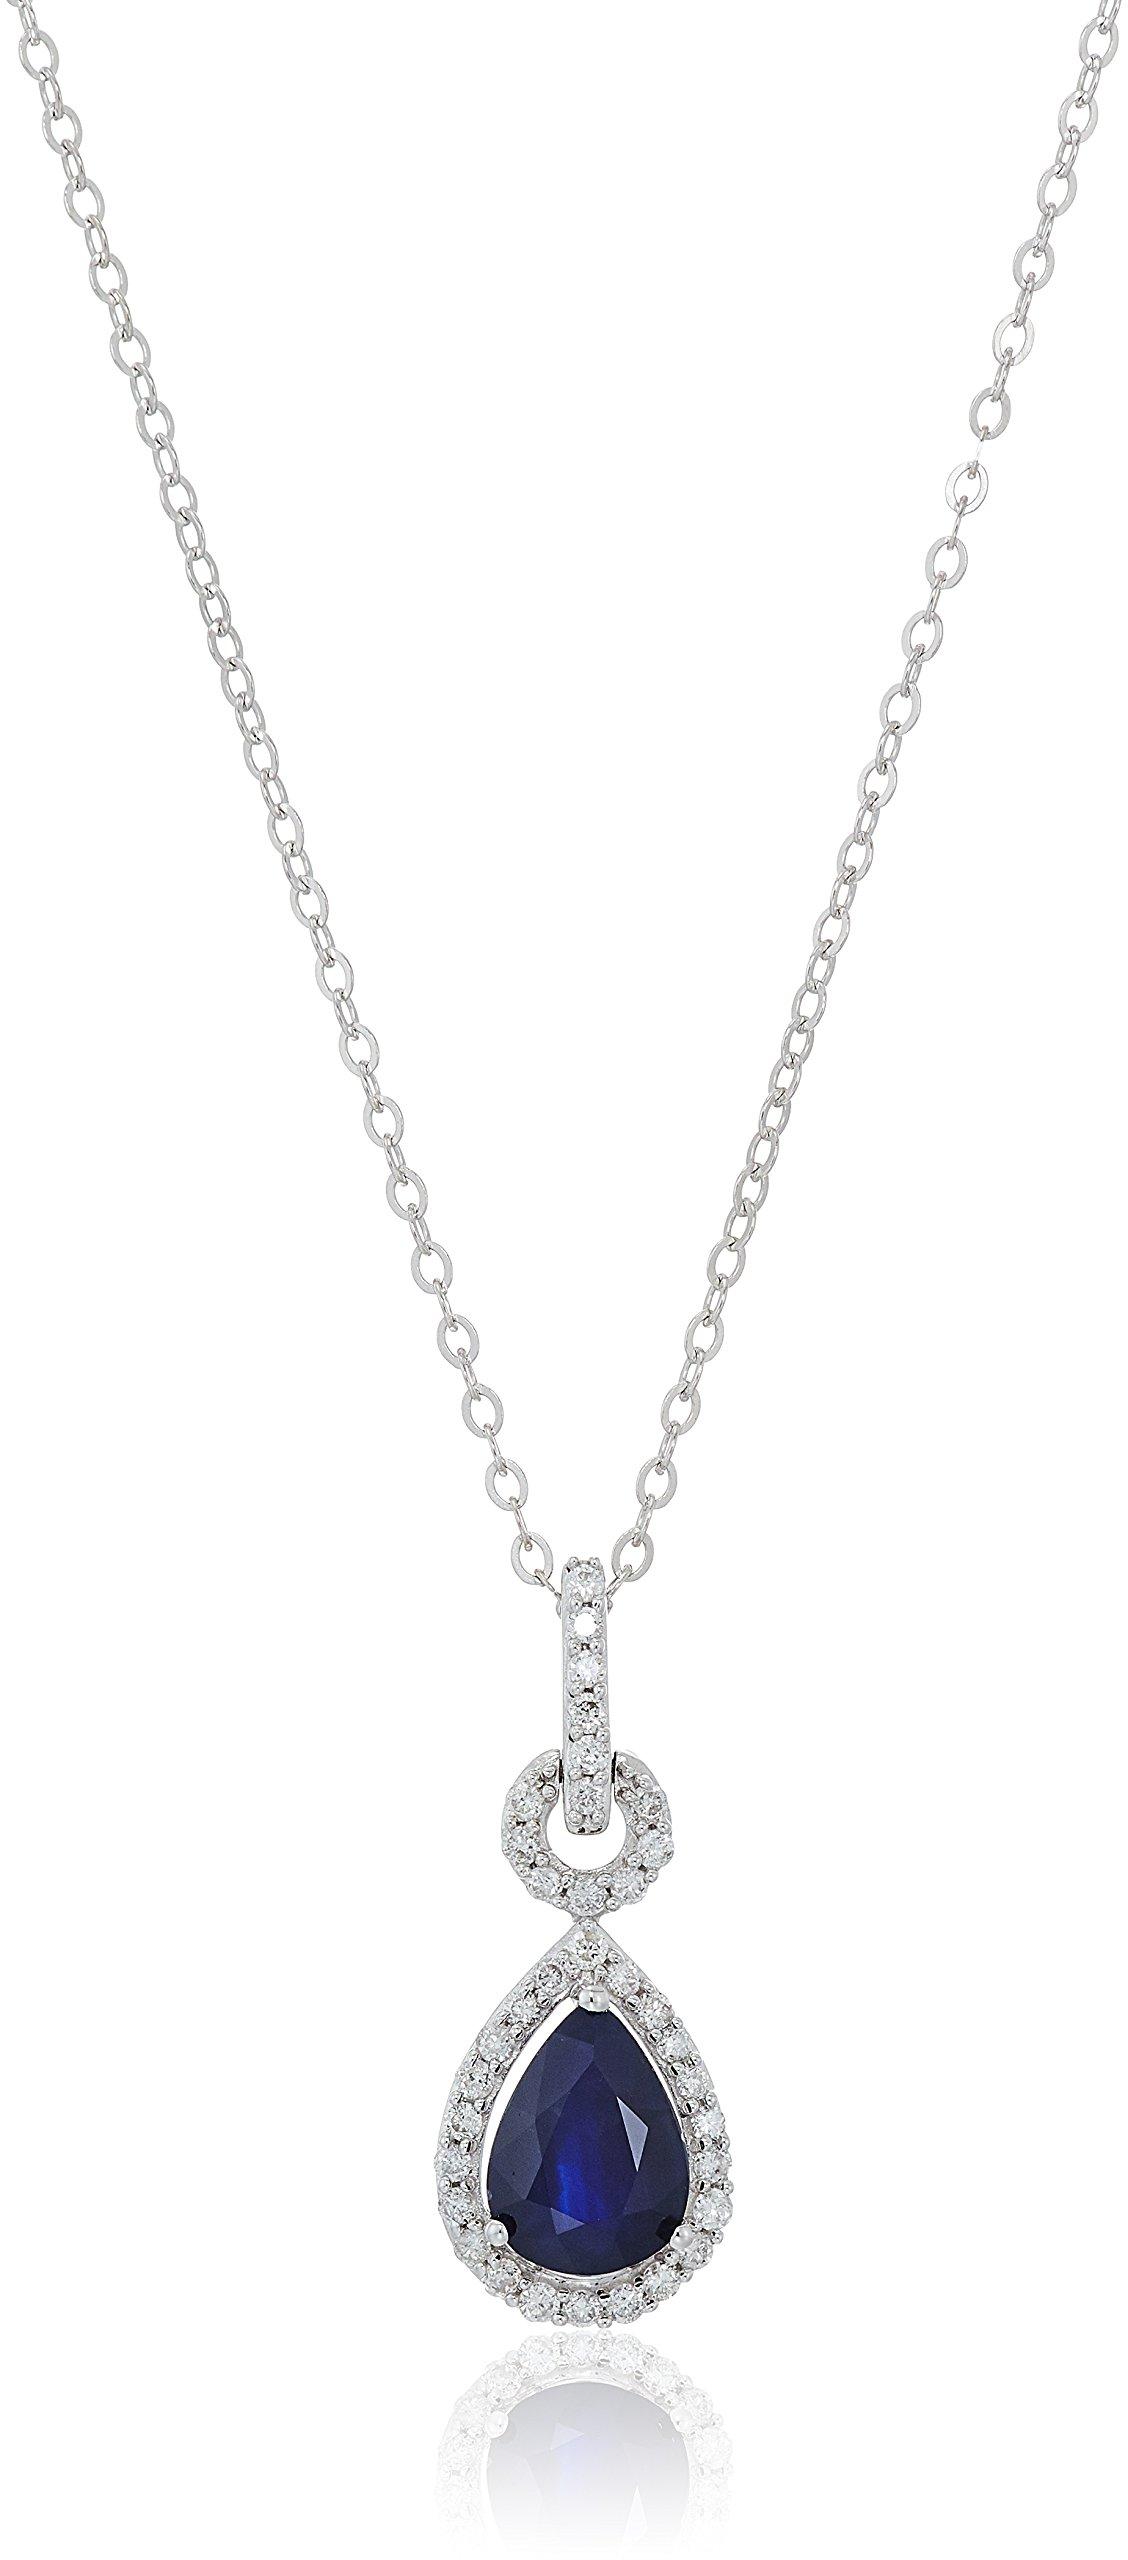 14k White Gold Pear Genuine Sapphire and Diamond Pendant Necklace, 18''